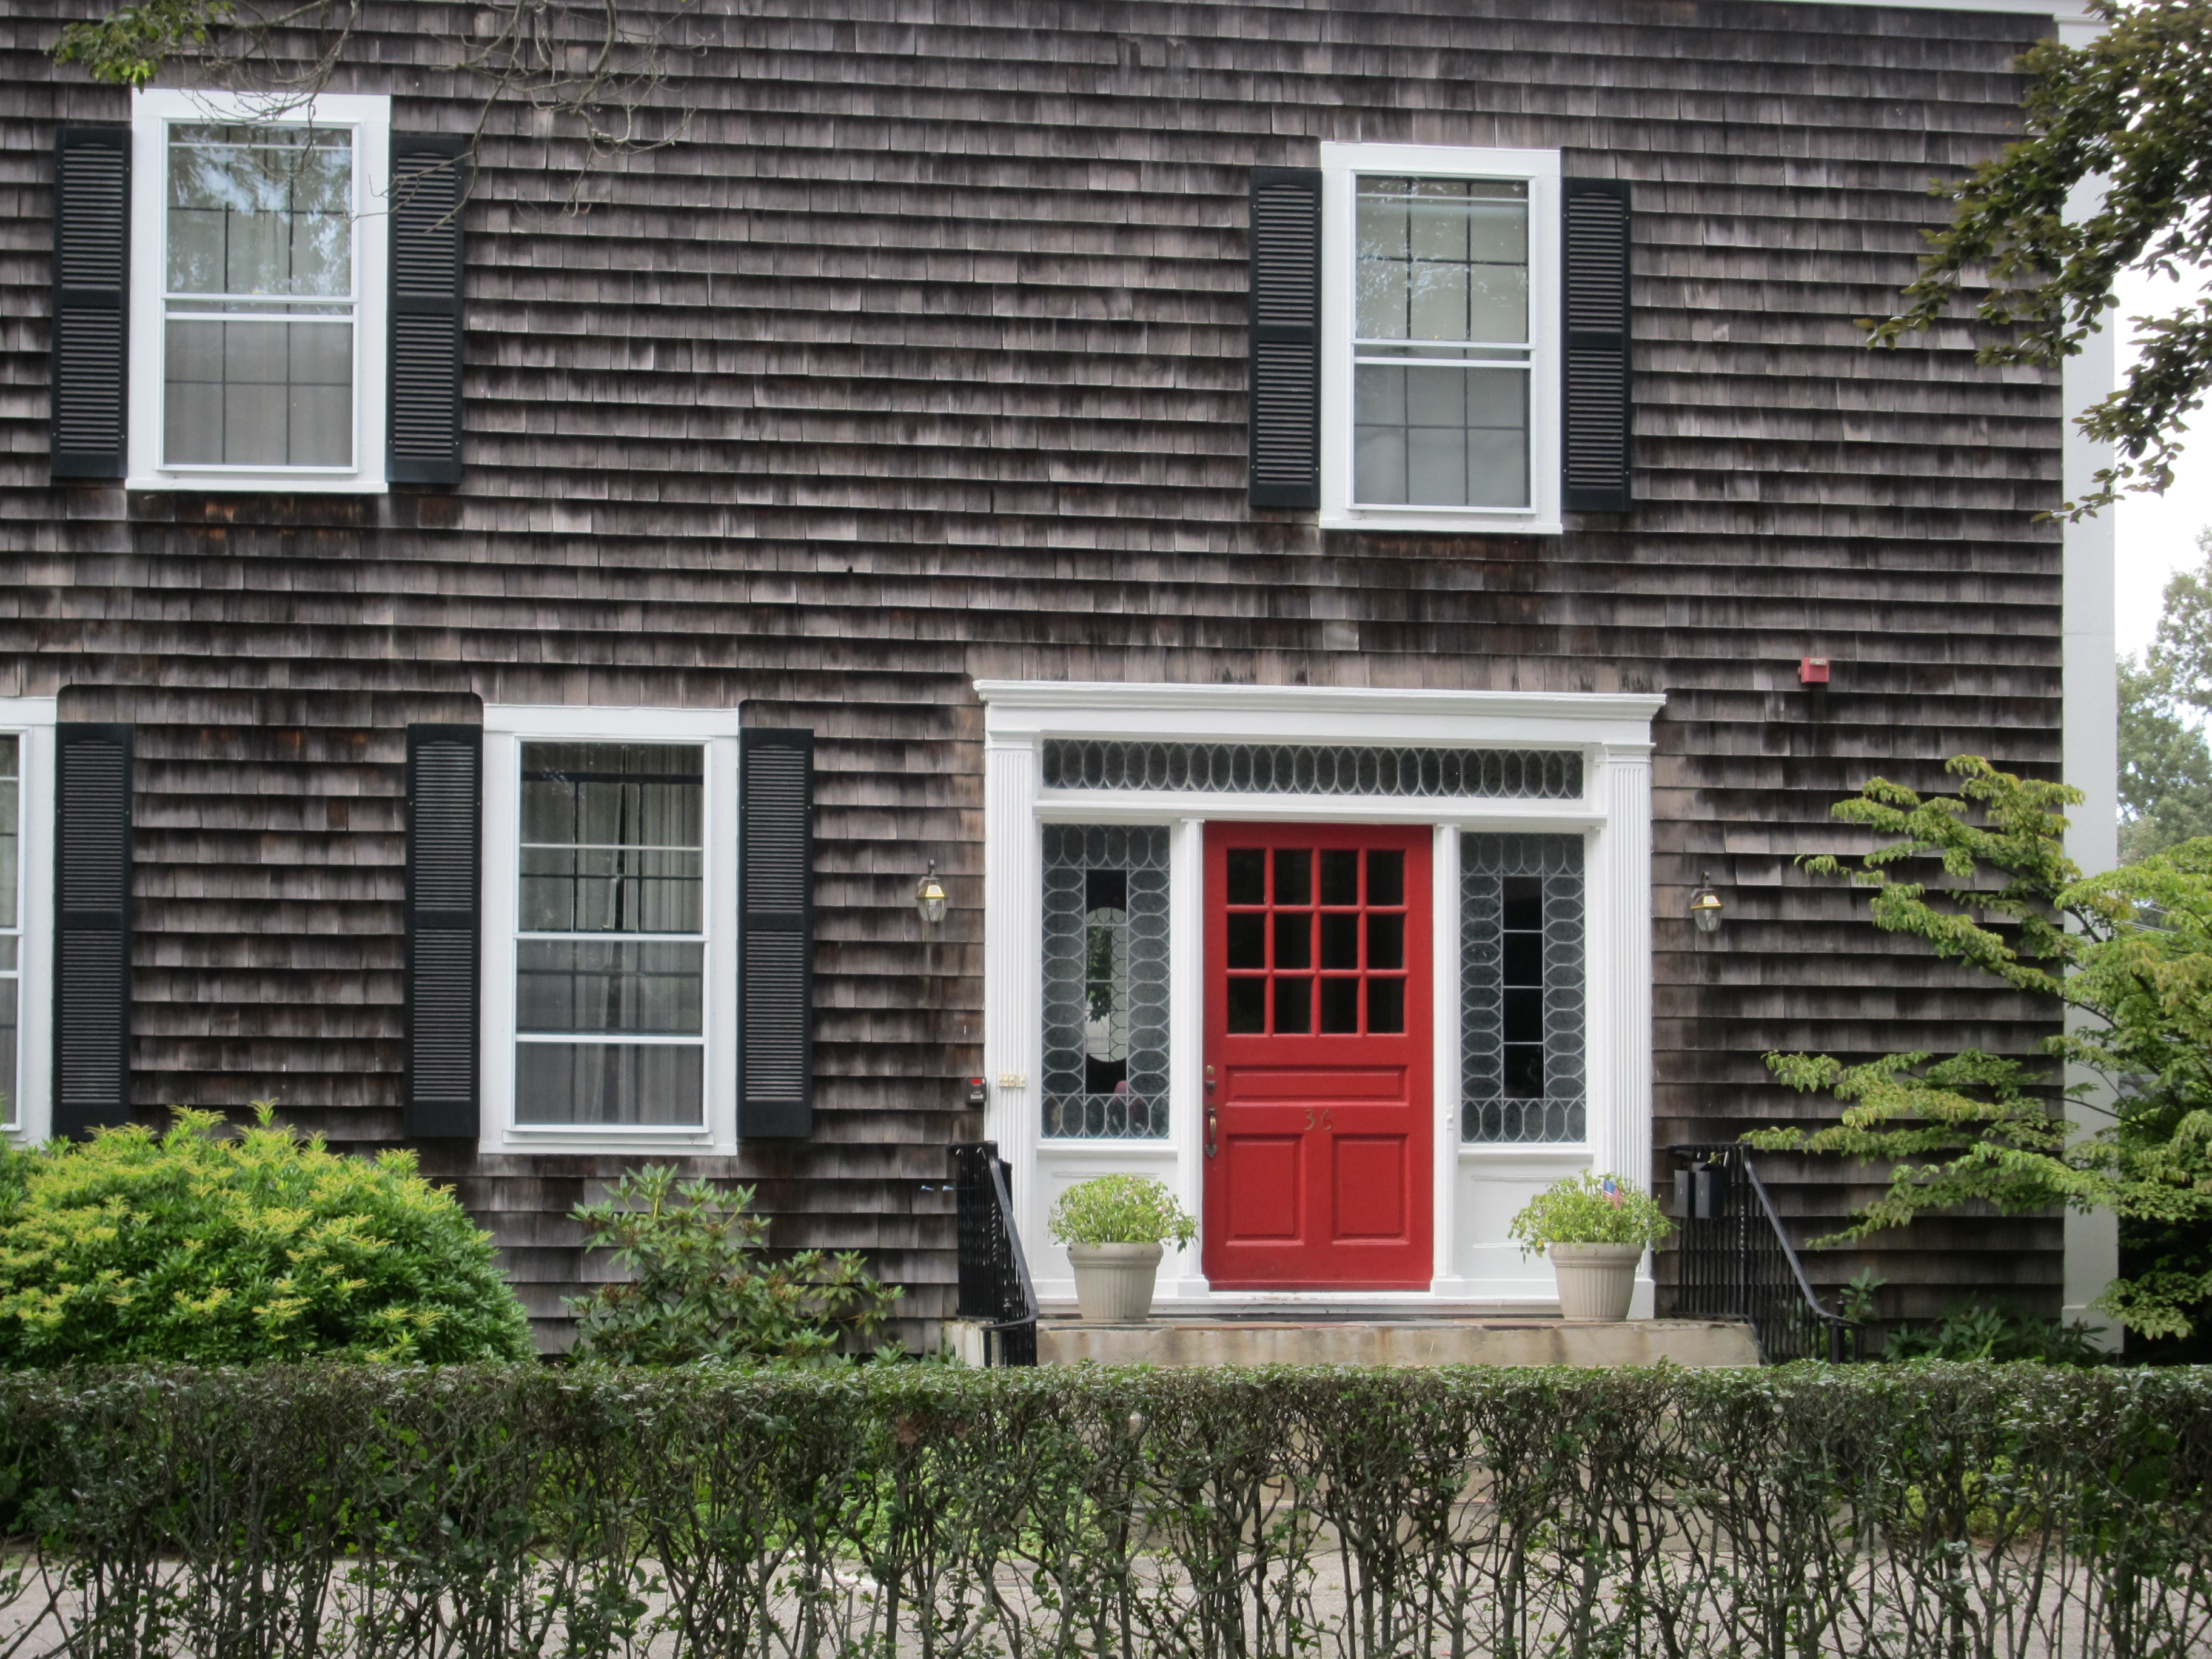 Red Door and Shingles